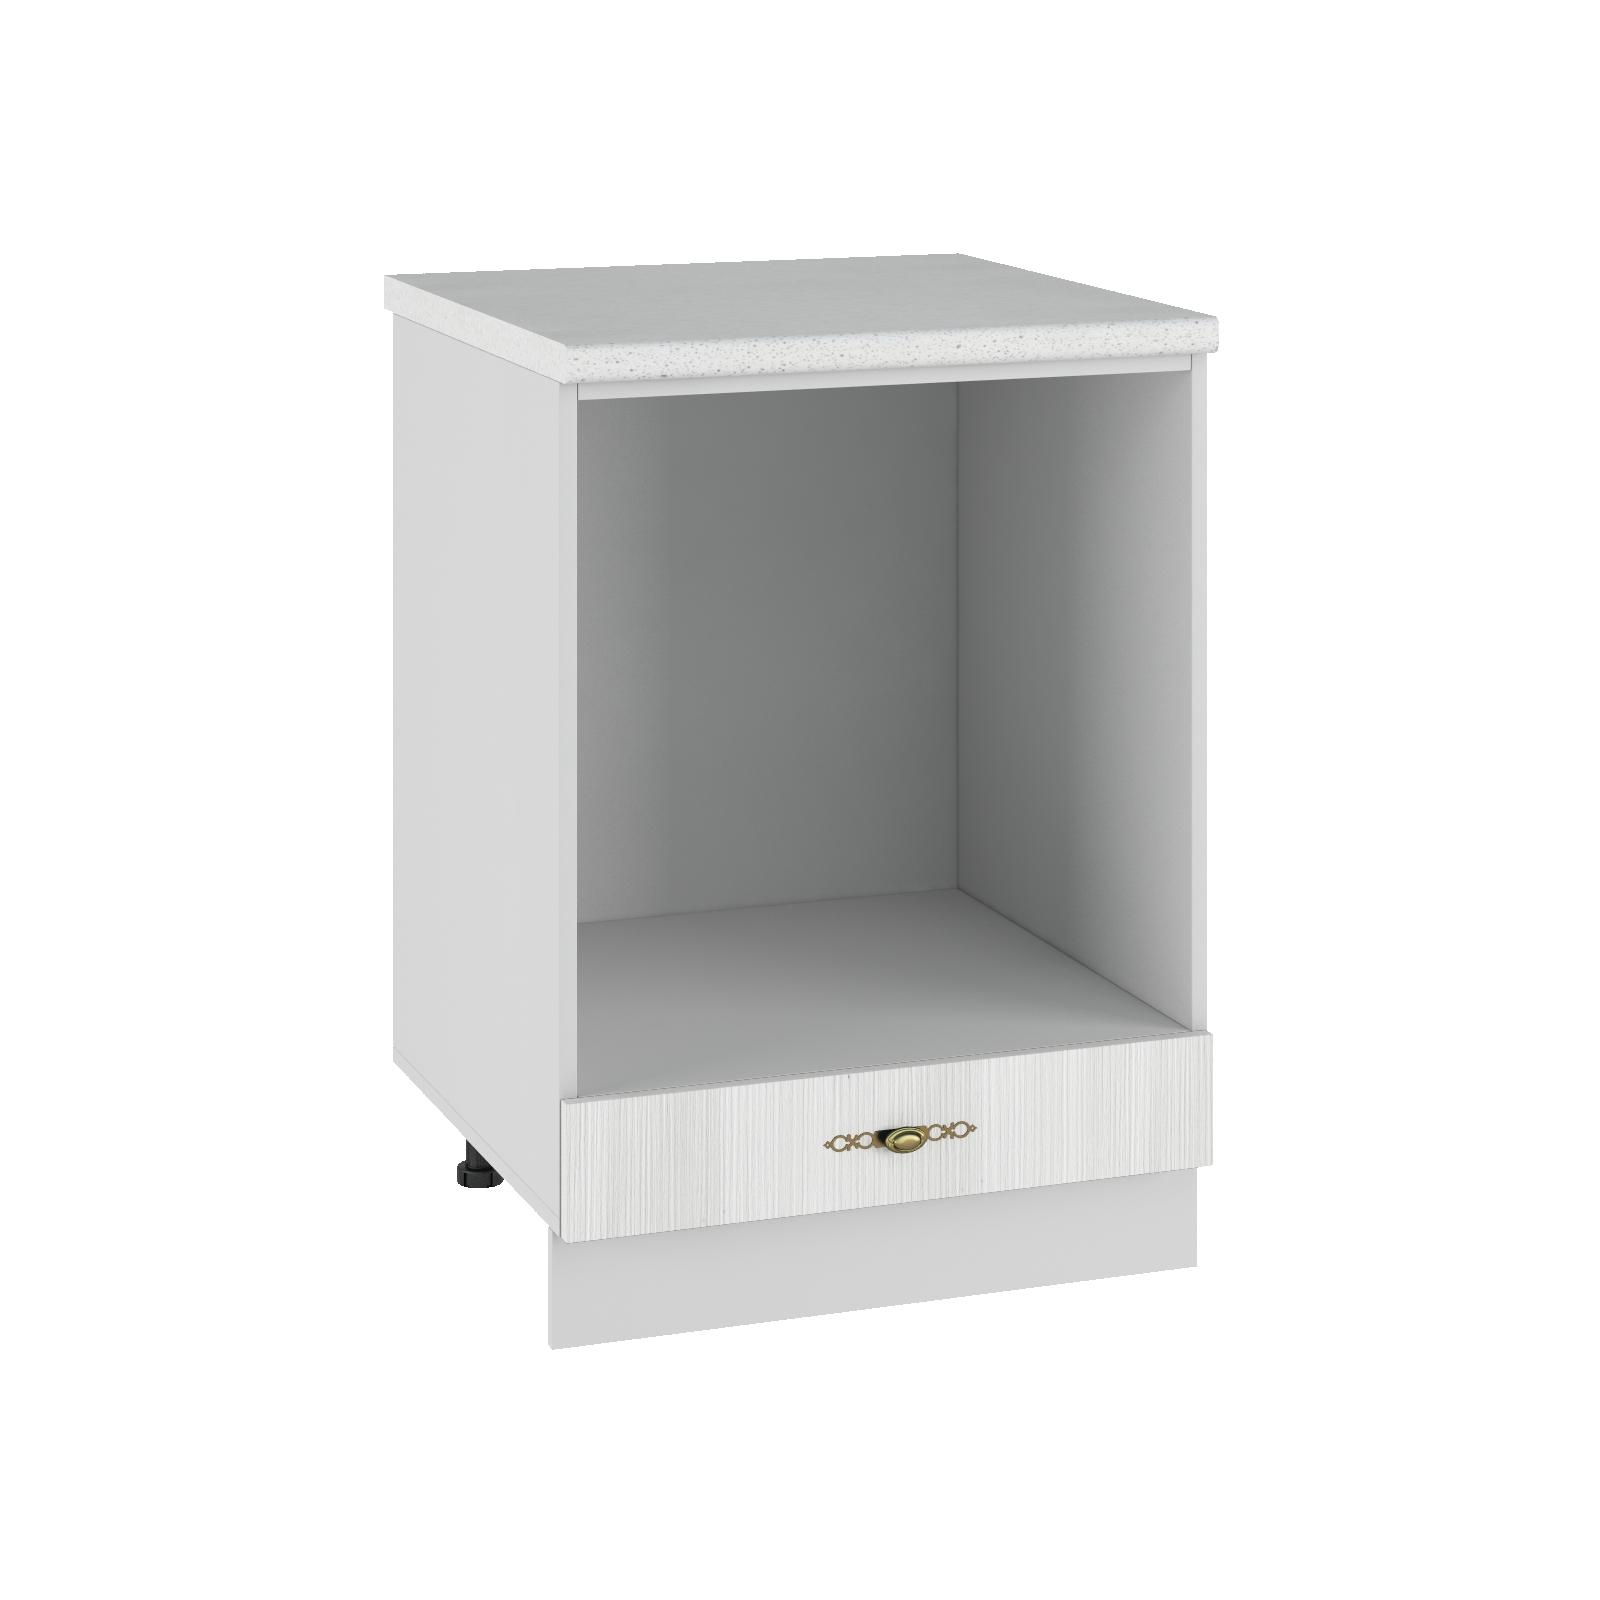 Кухня Монако СД 600 Шкаф нижний духовой